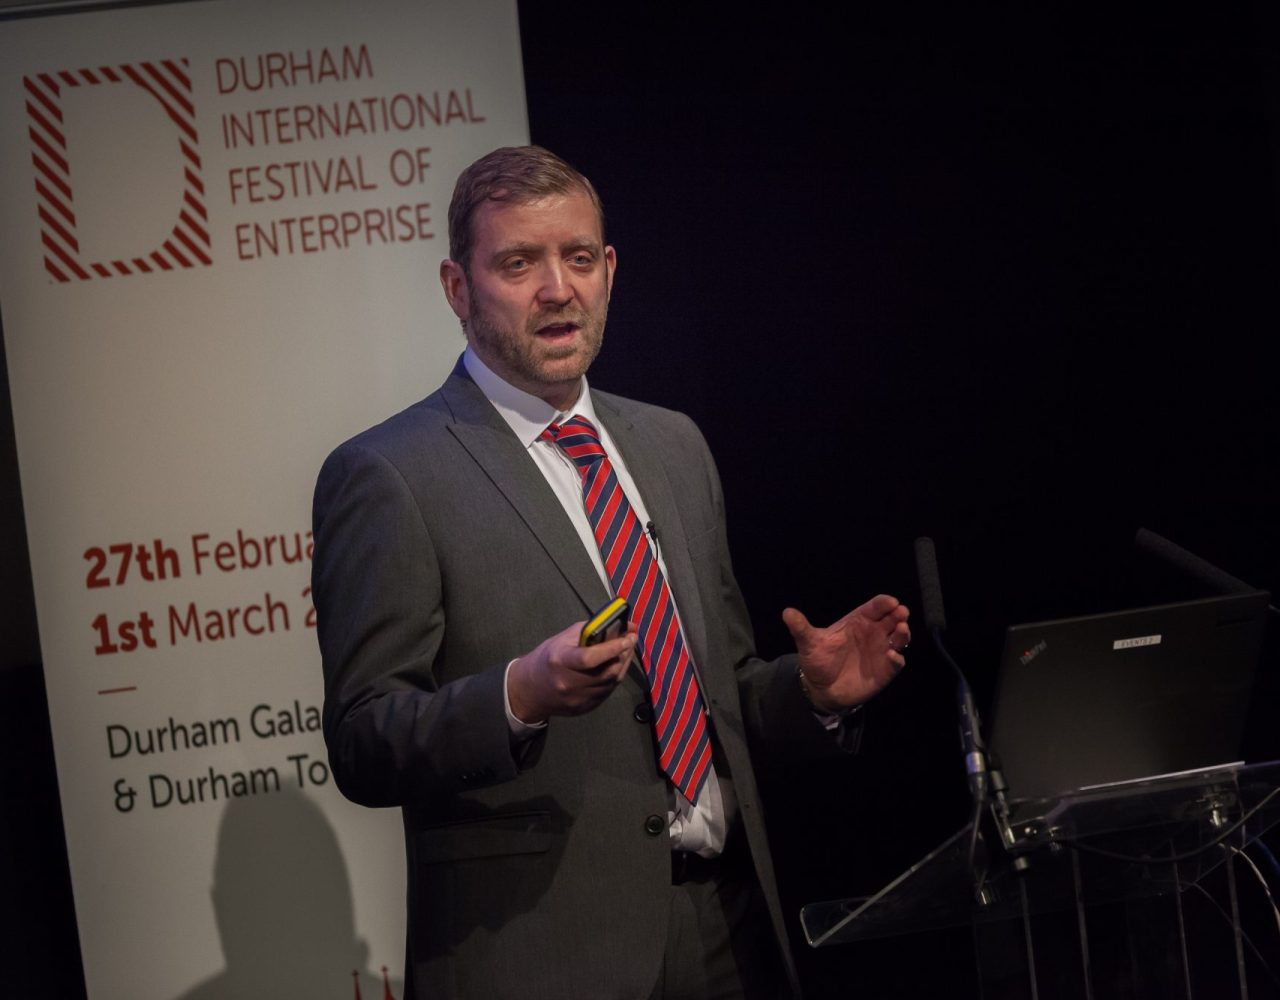 Seaham company GAS launches new digital platform